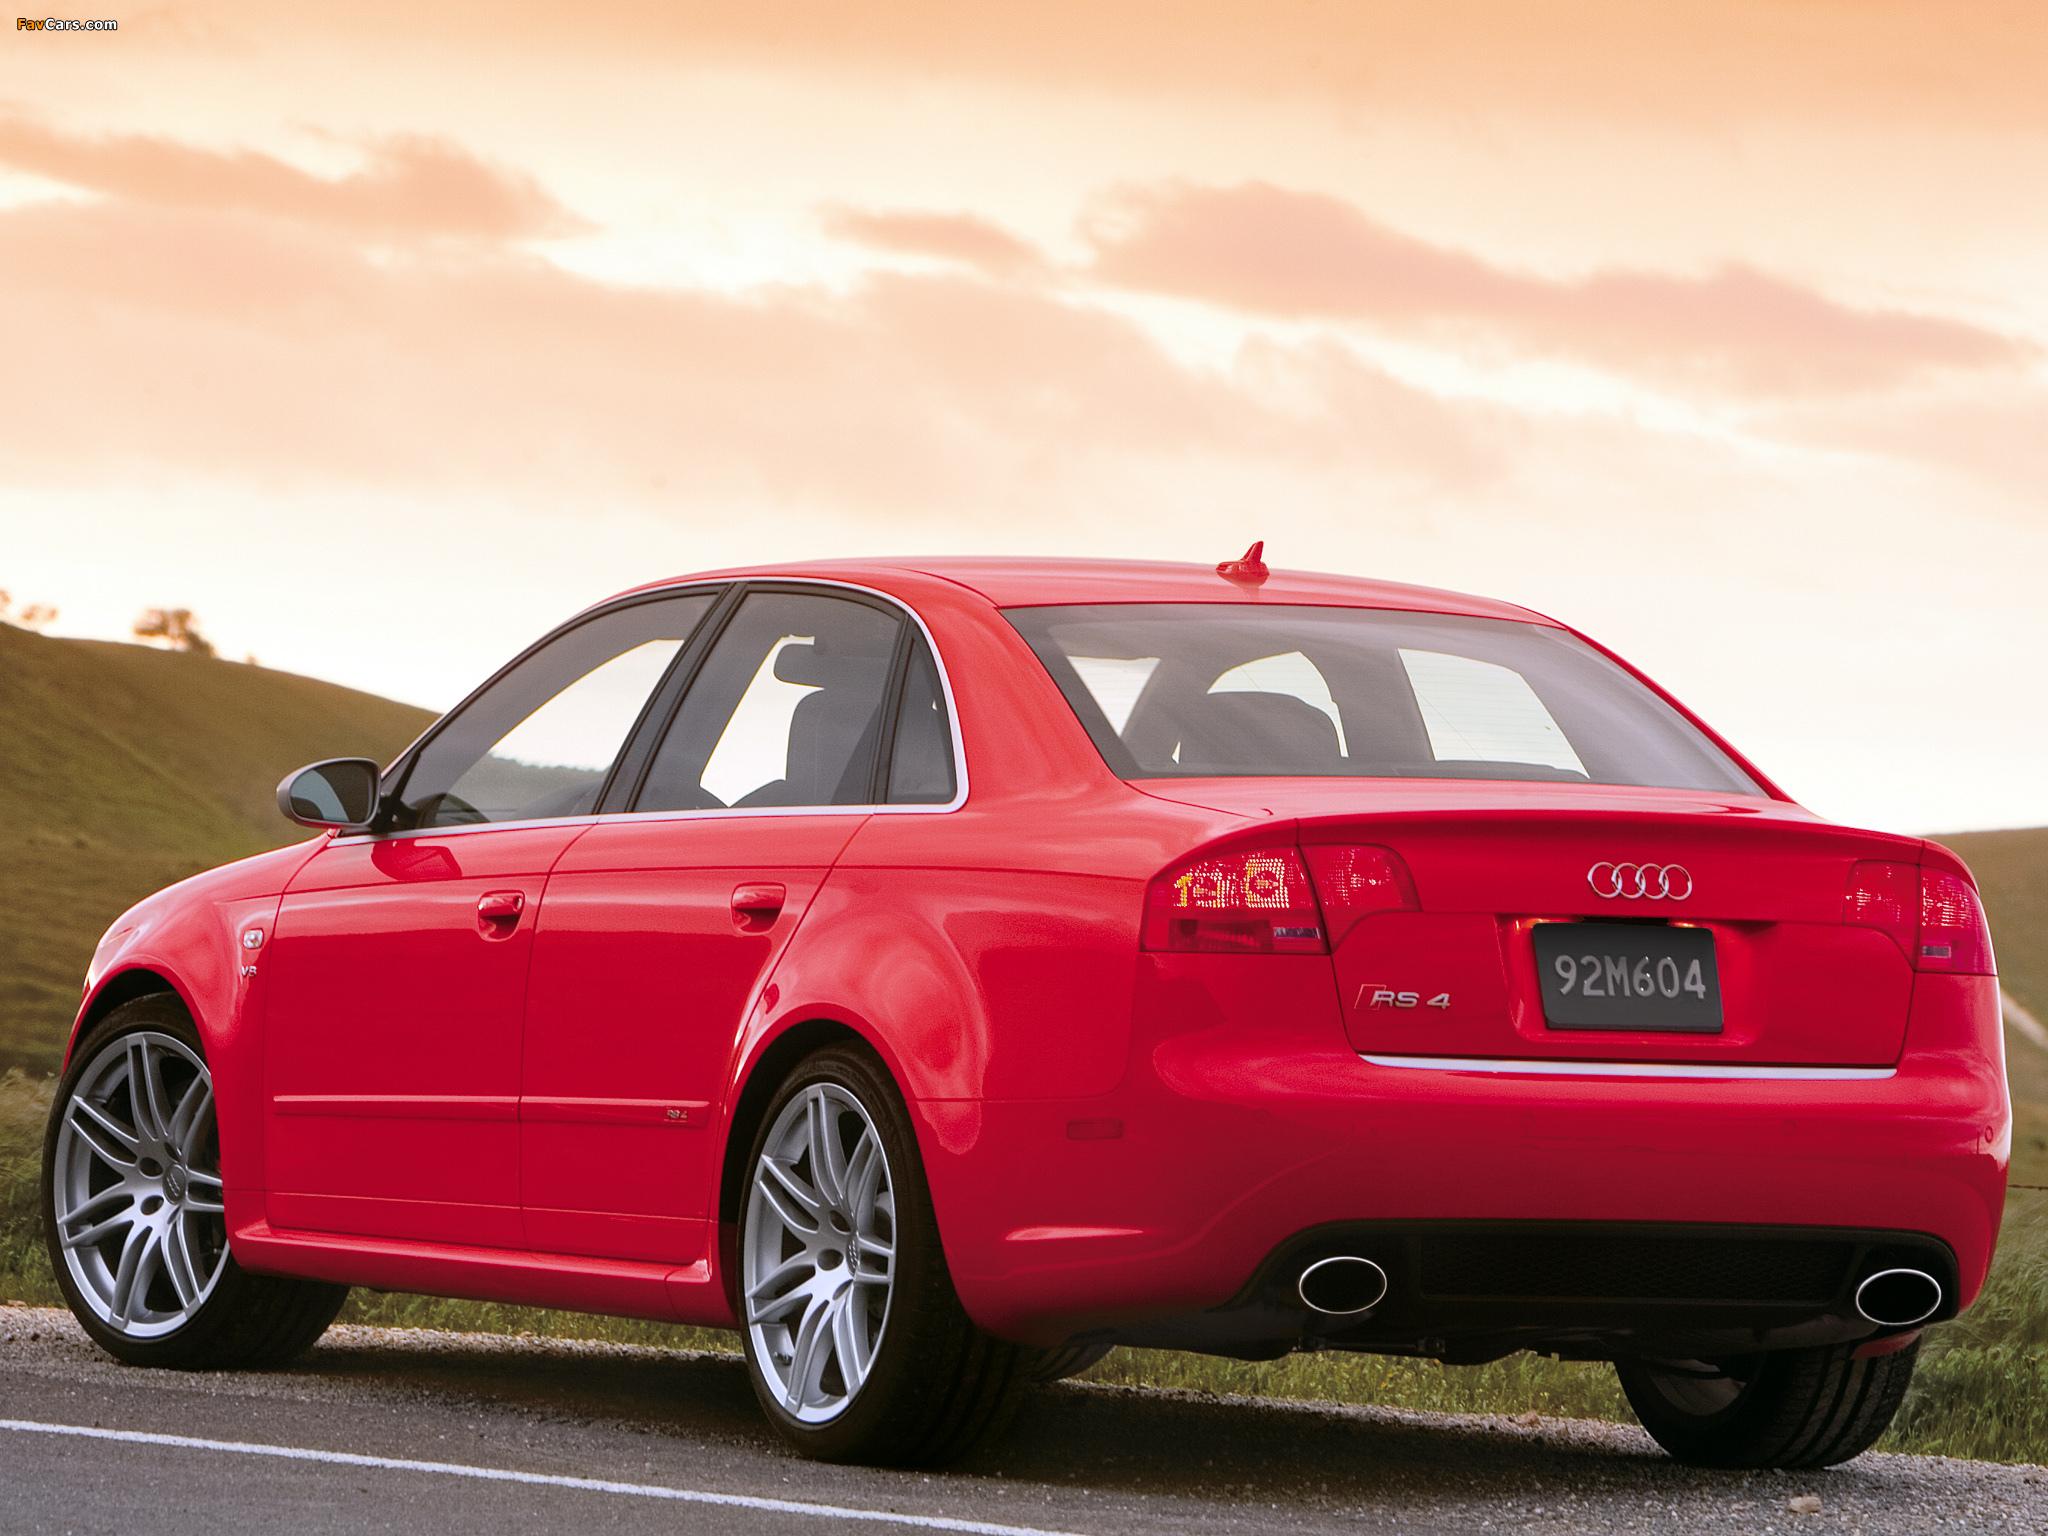 Pictures Of Audi RS Sedan USspec BE X - 2005 audi rs4